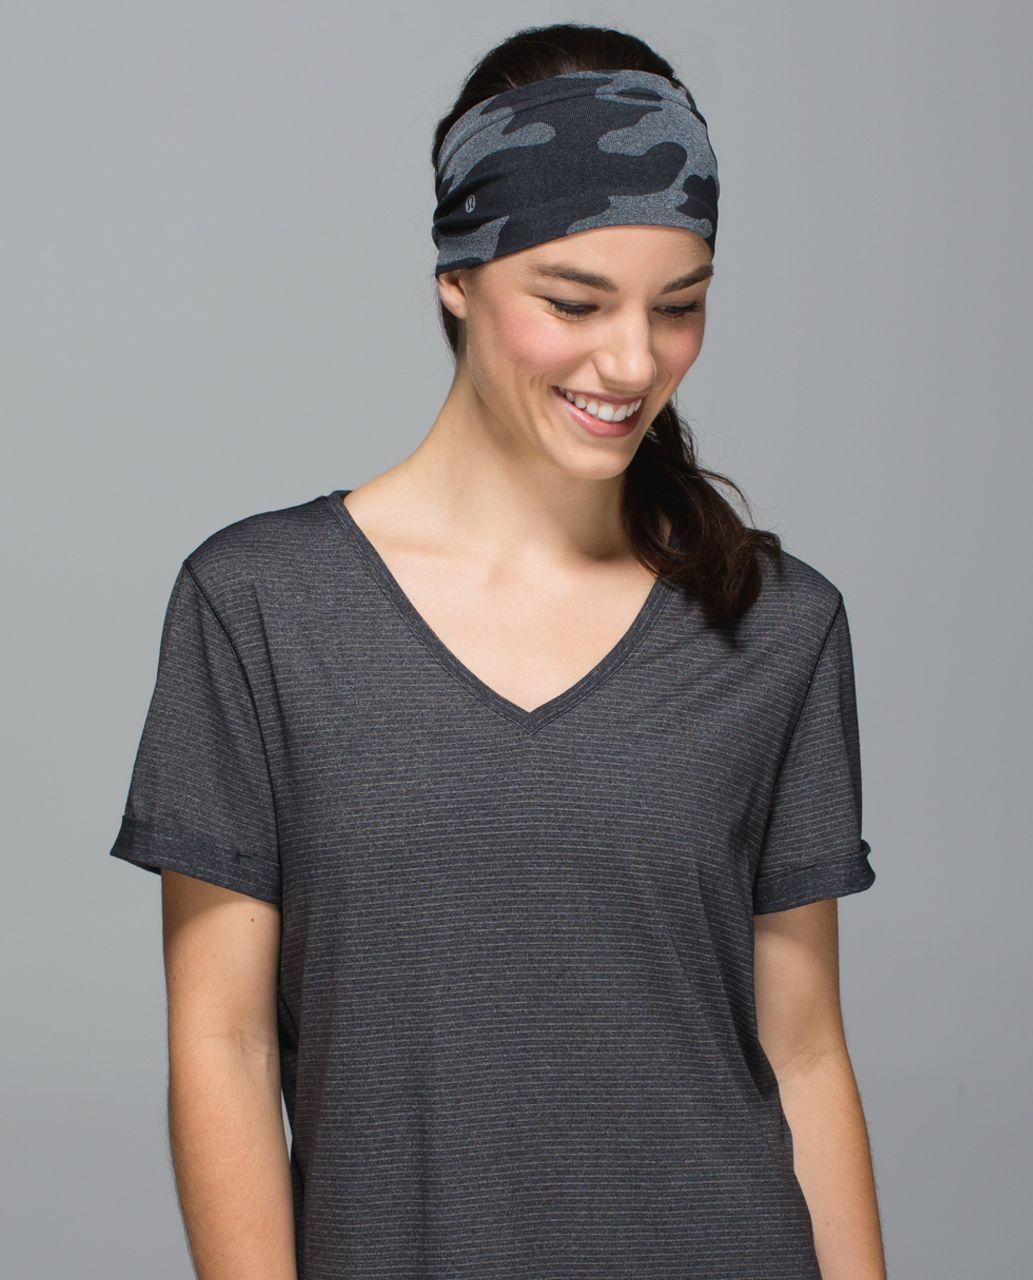 Lululemon Bangs Back Headwrap - Heathered Black (Camo)